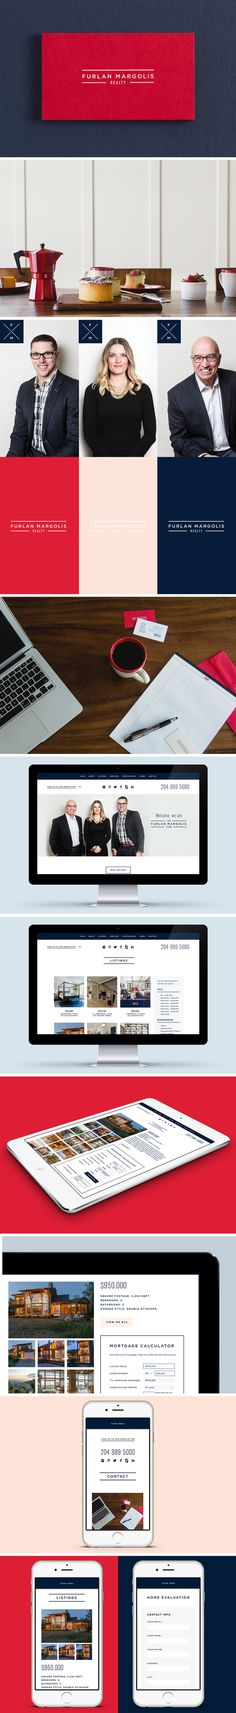 Furlan Margolis Brand Identity + Website Design - One Plus One Design #Brand #Identity #Website #Design #BrandIdentity #Branding